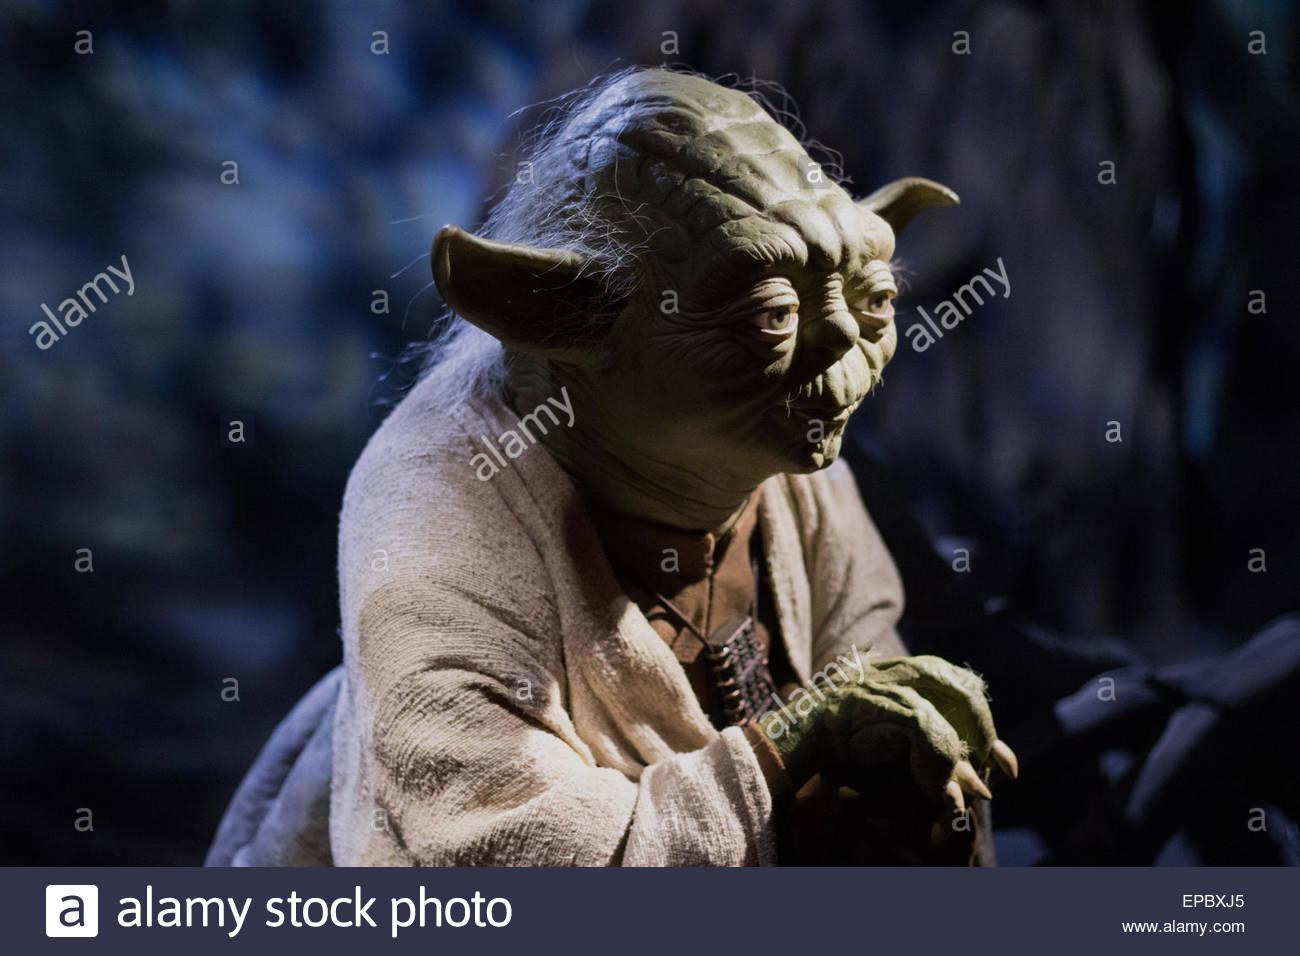 Yoda Film Stockfotos & Yoda Film Bilder - Alamy